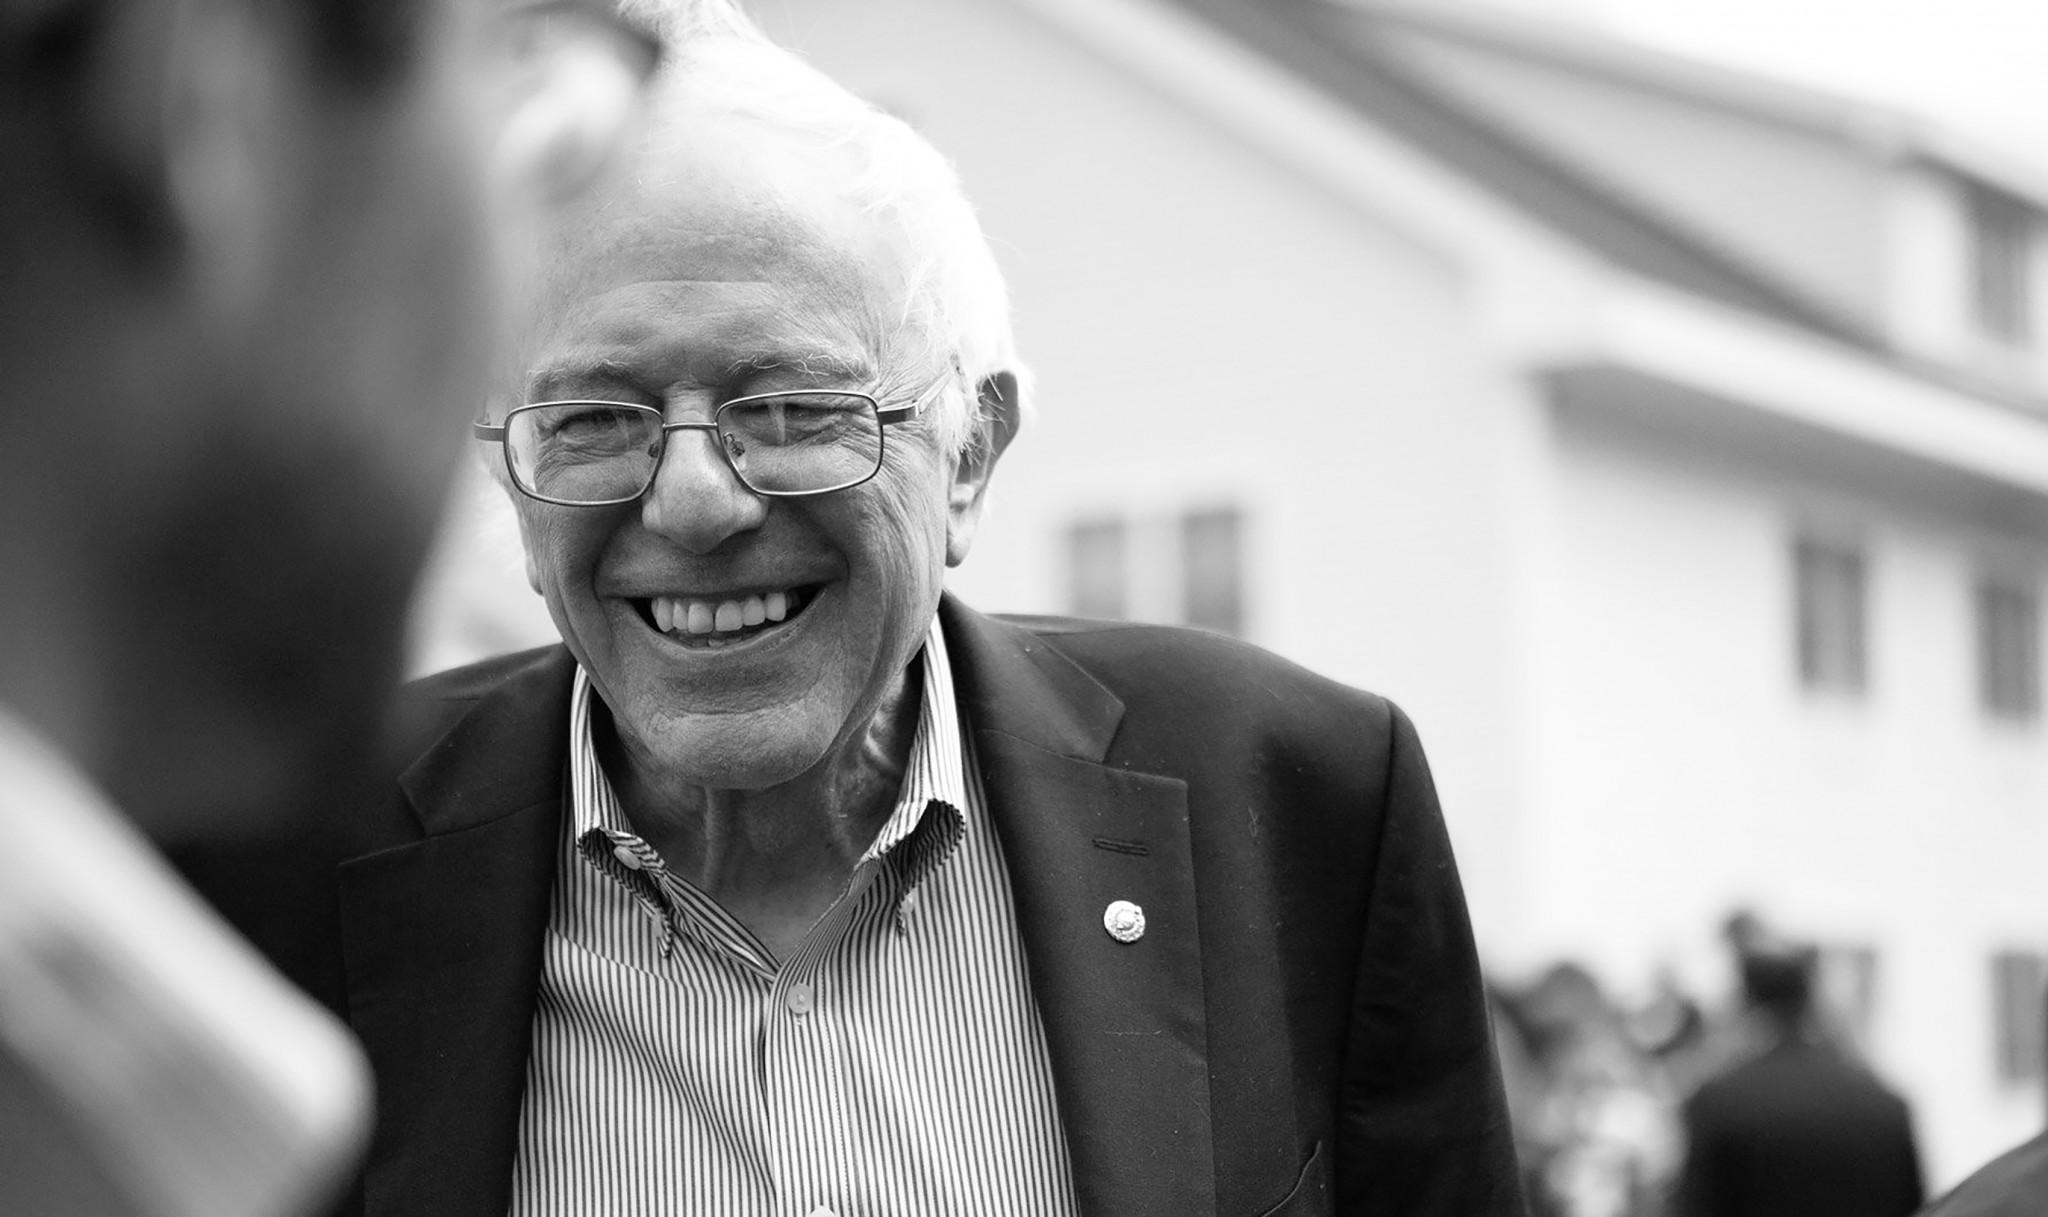 Courtesy+of+Bernie+Sanders%27+Campaign